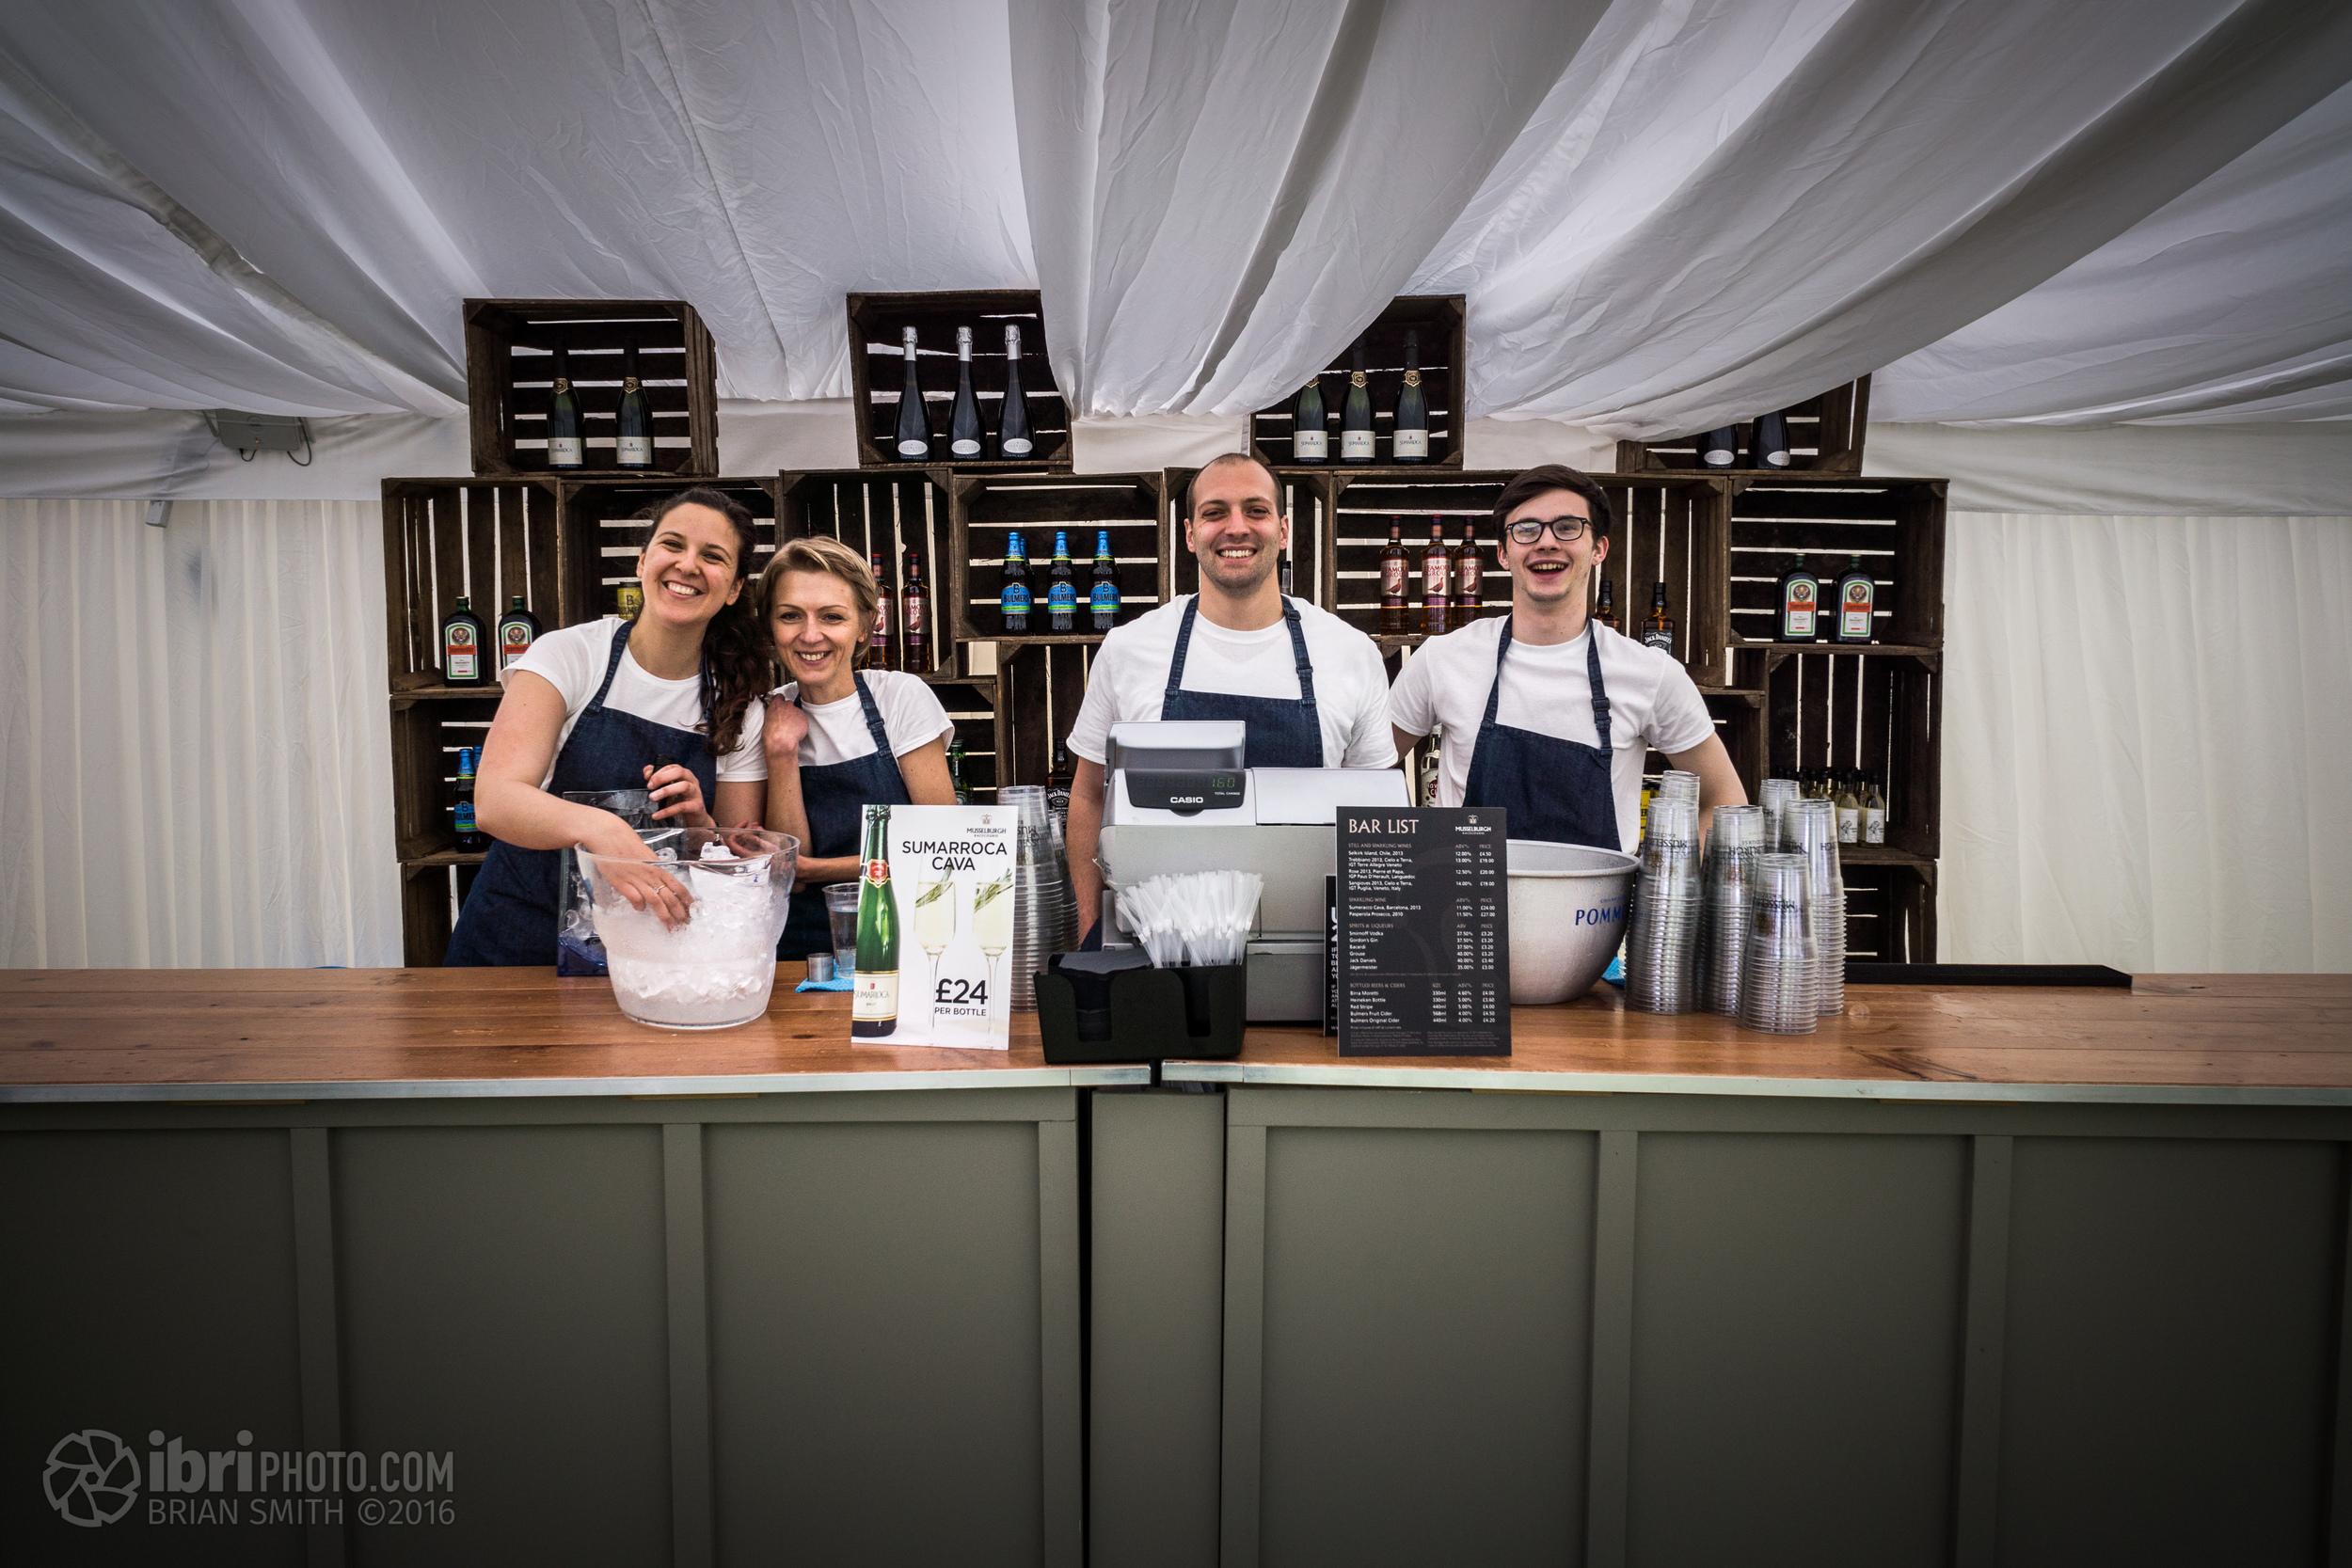 The Bar Staff